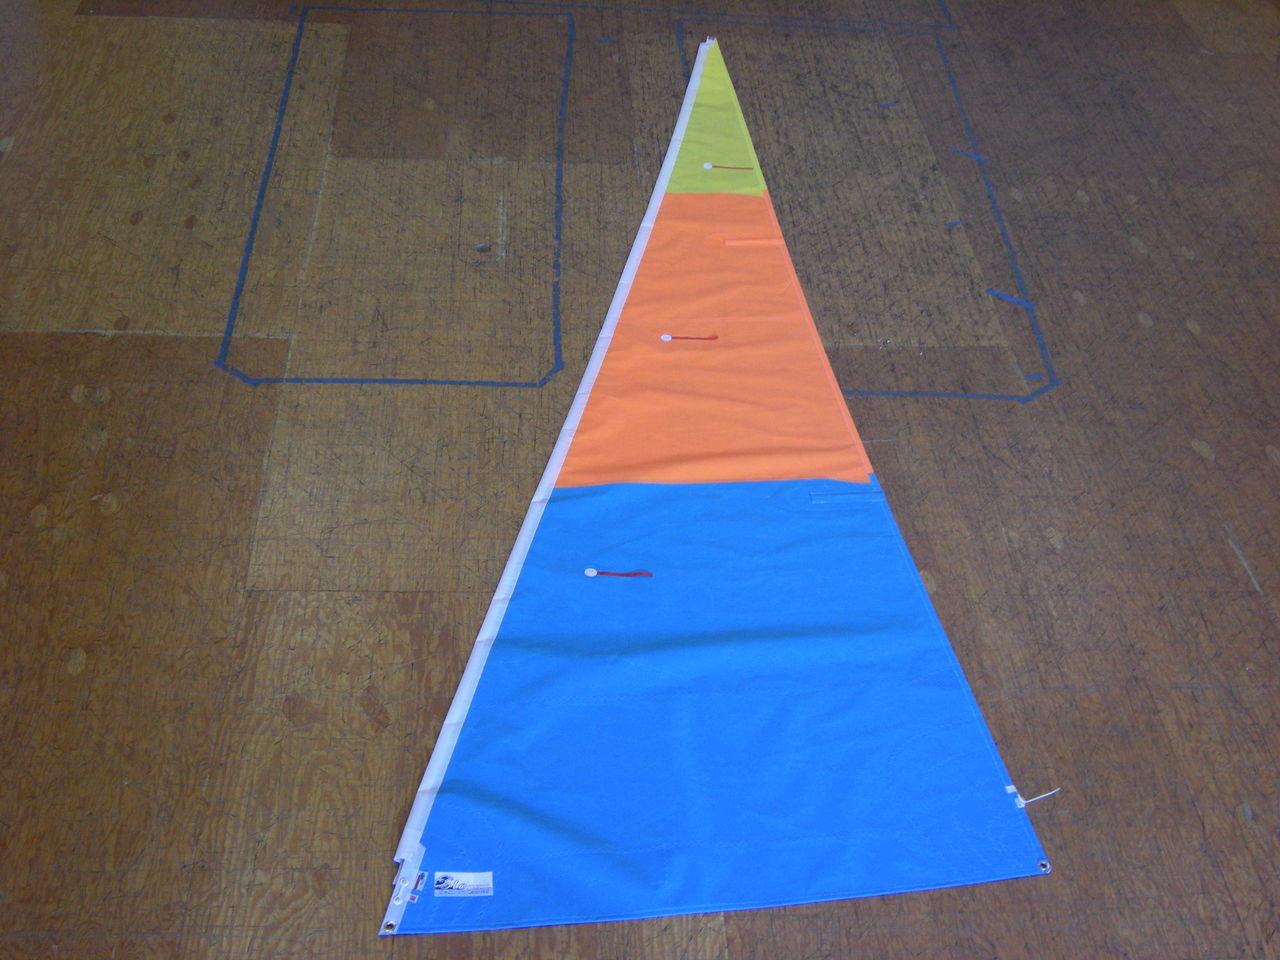 prindle 16 jib sail